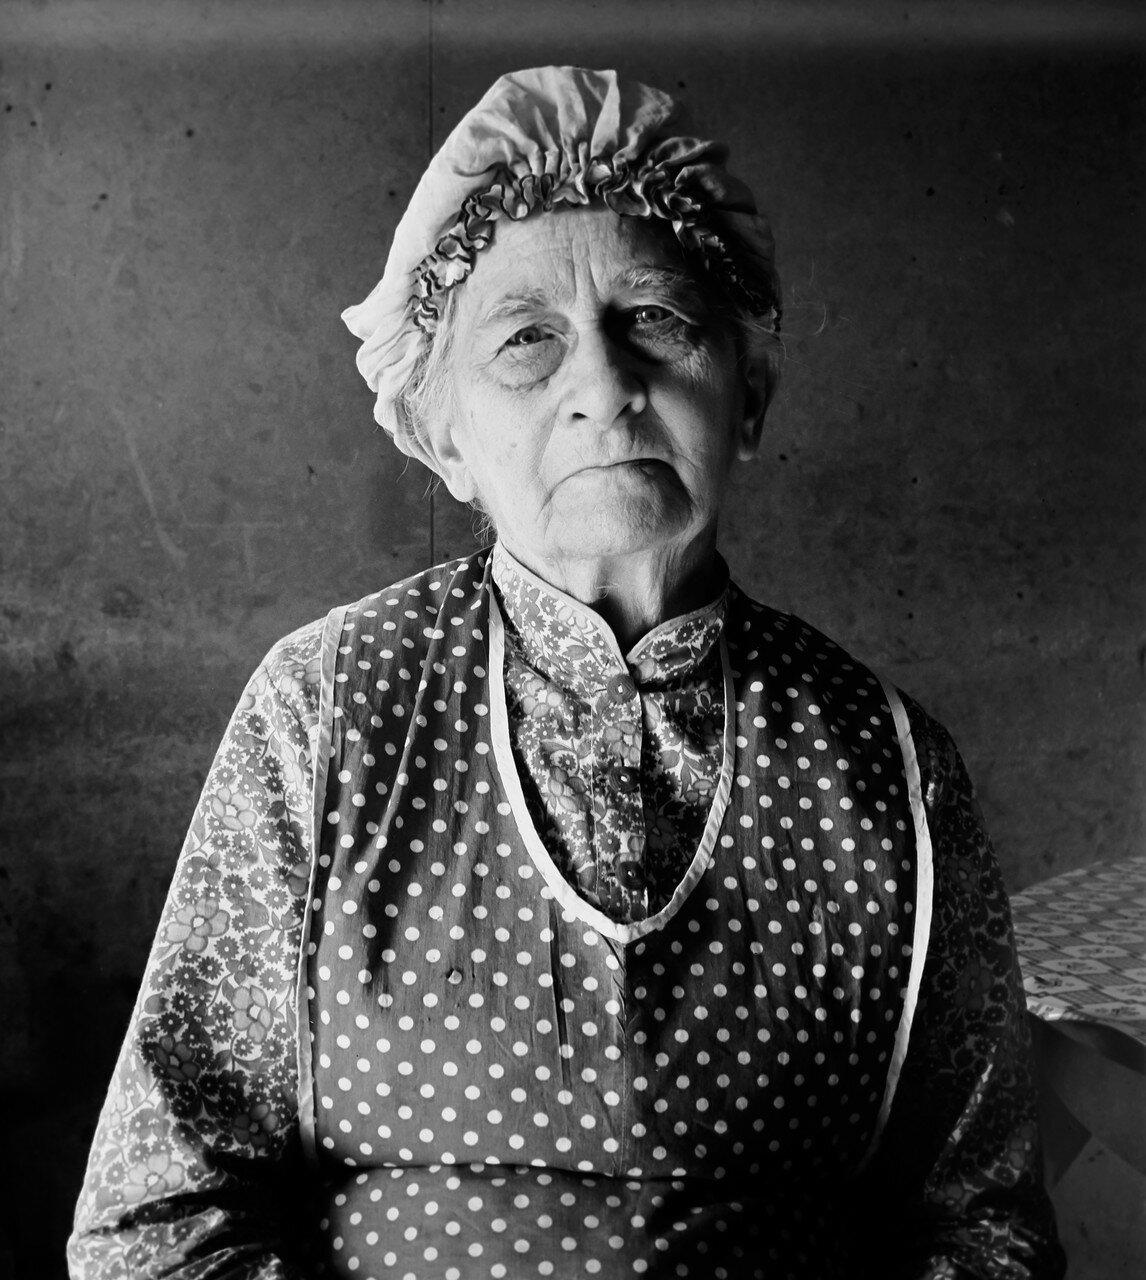 1939. Бабушка живущая в семье арендатора. Уиллоу Крик. Орегон